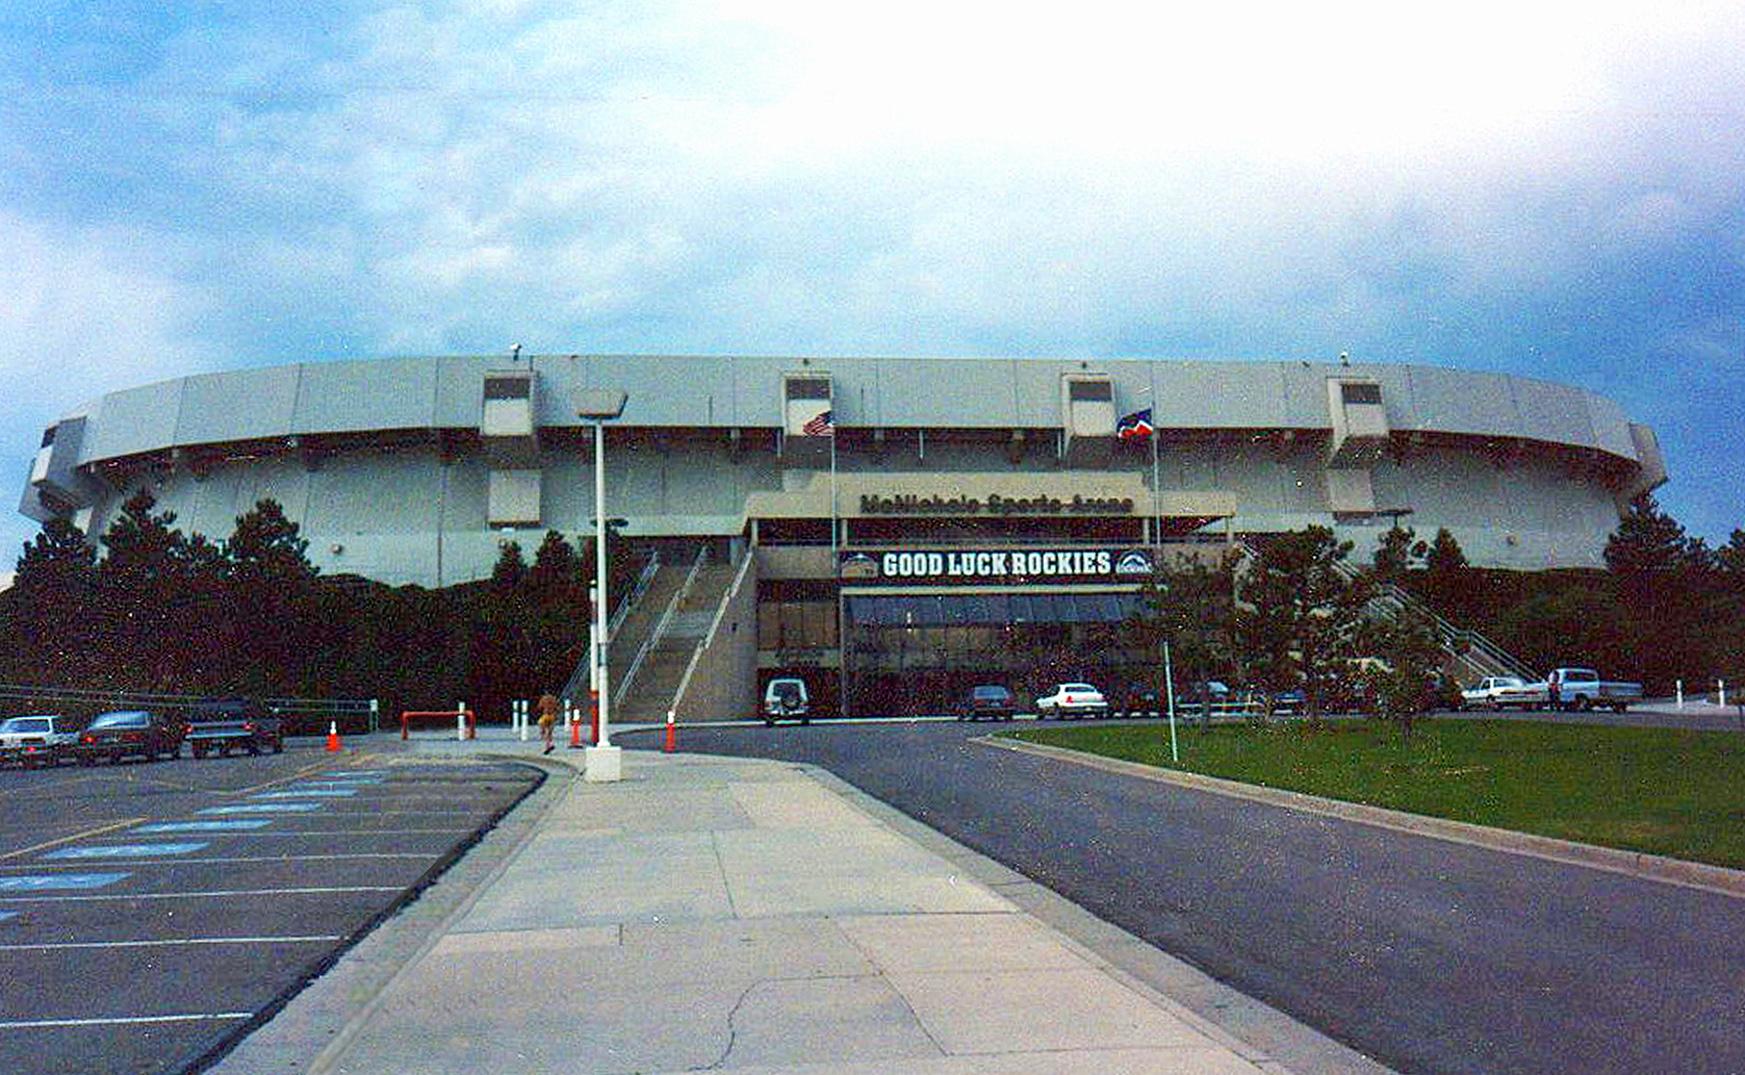 McNichols_Sports_Arena_1994.jpg